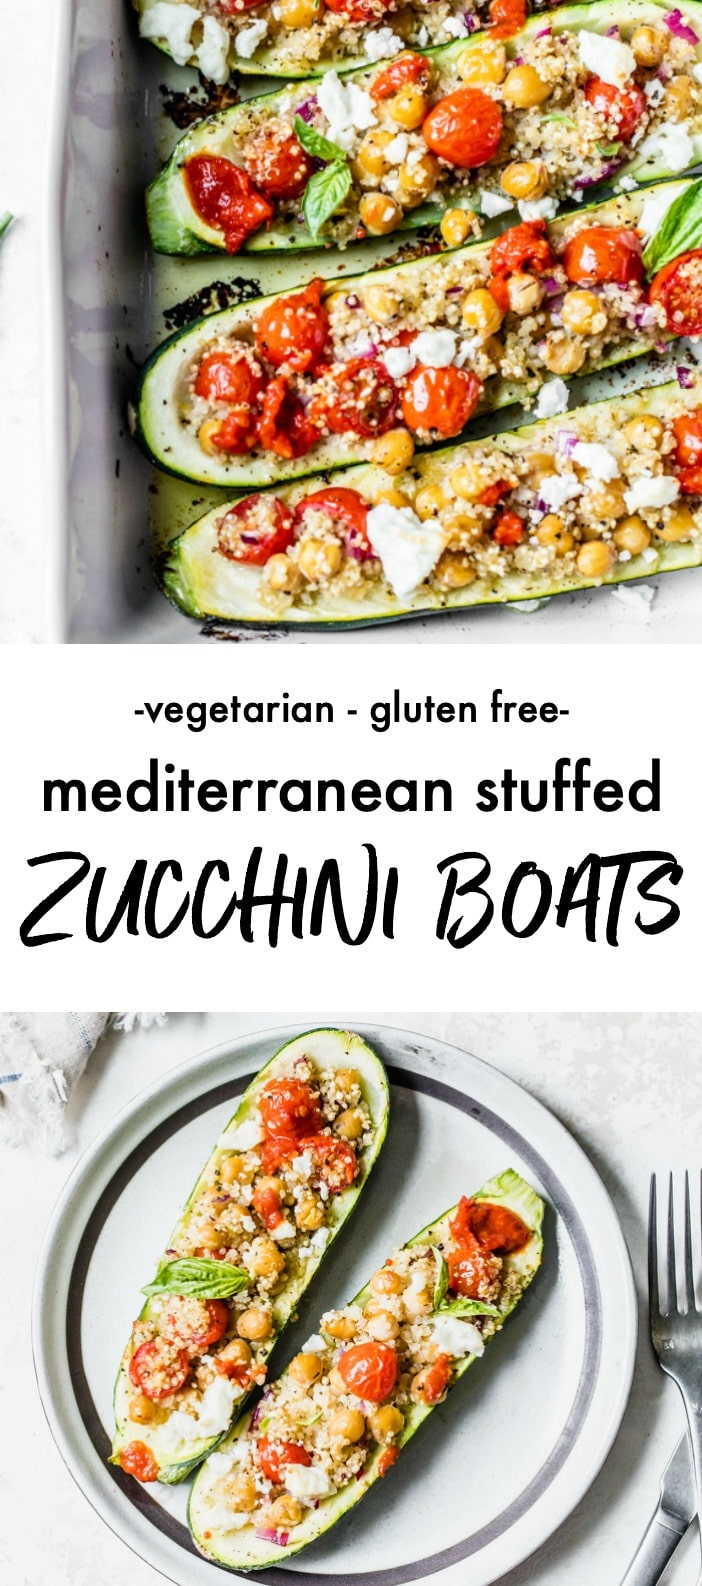 Stuffed zucchini filled with quinoa